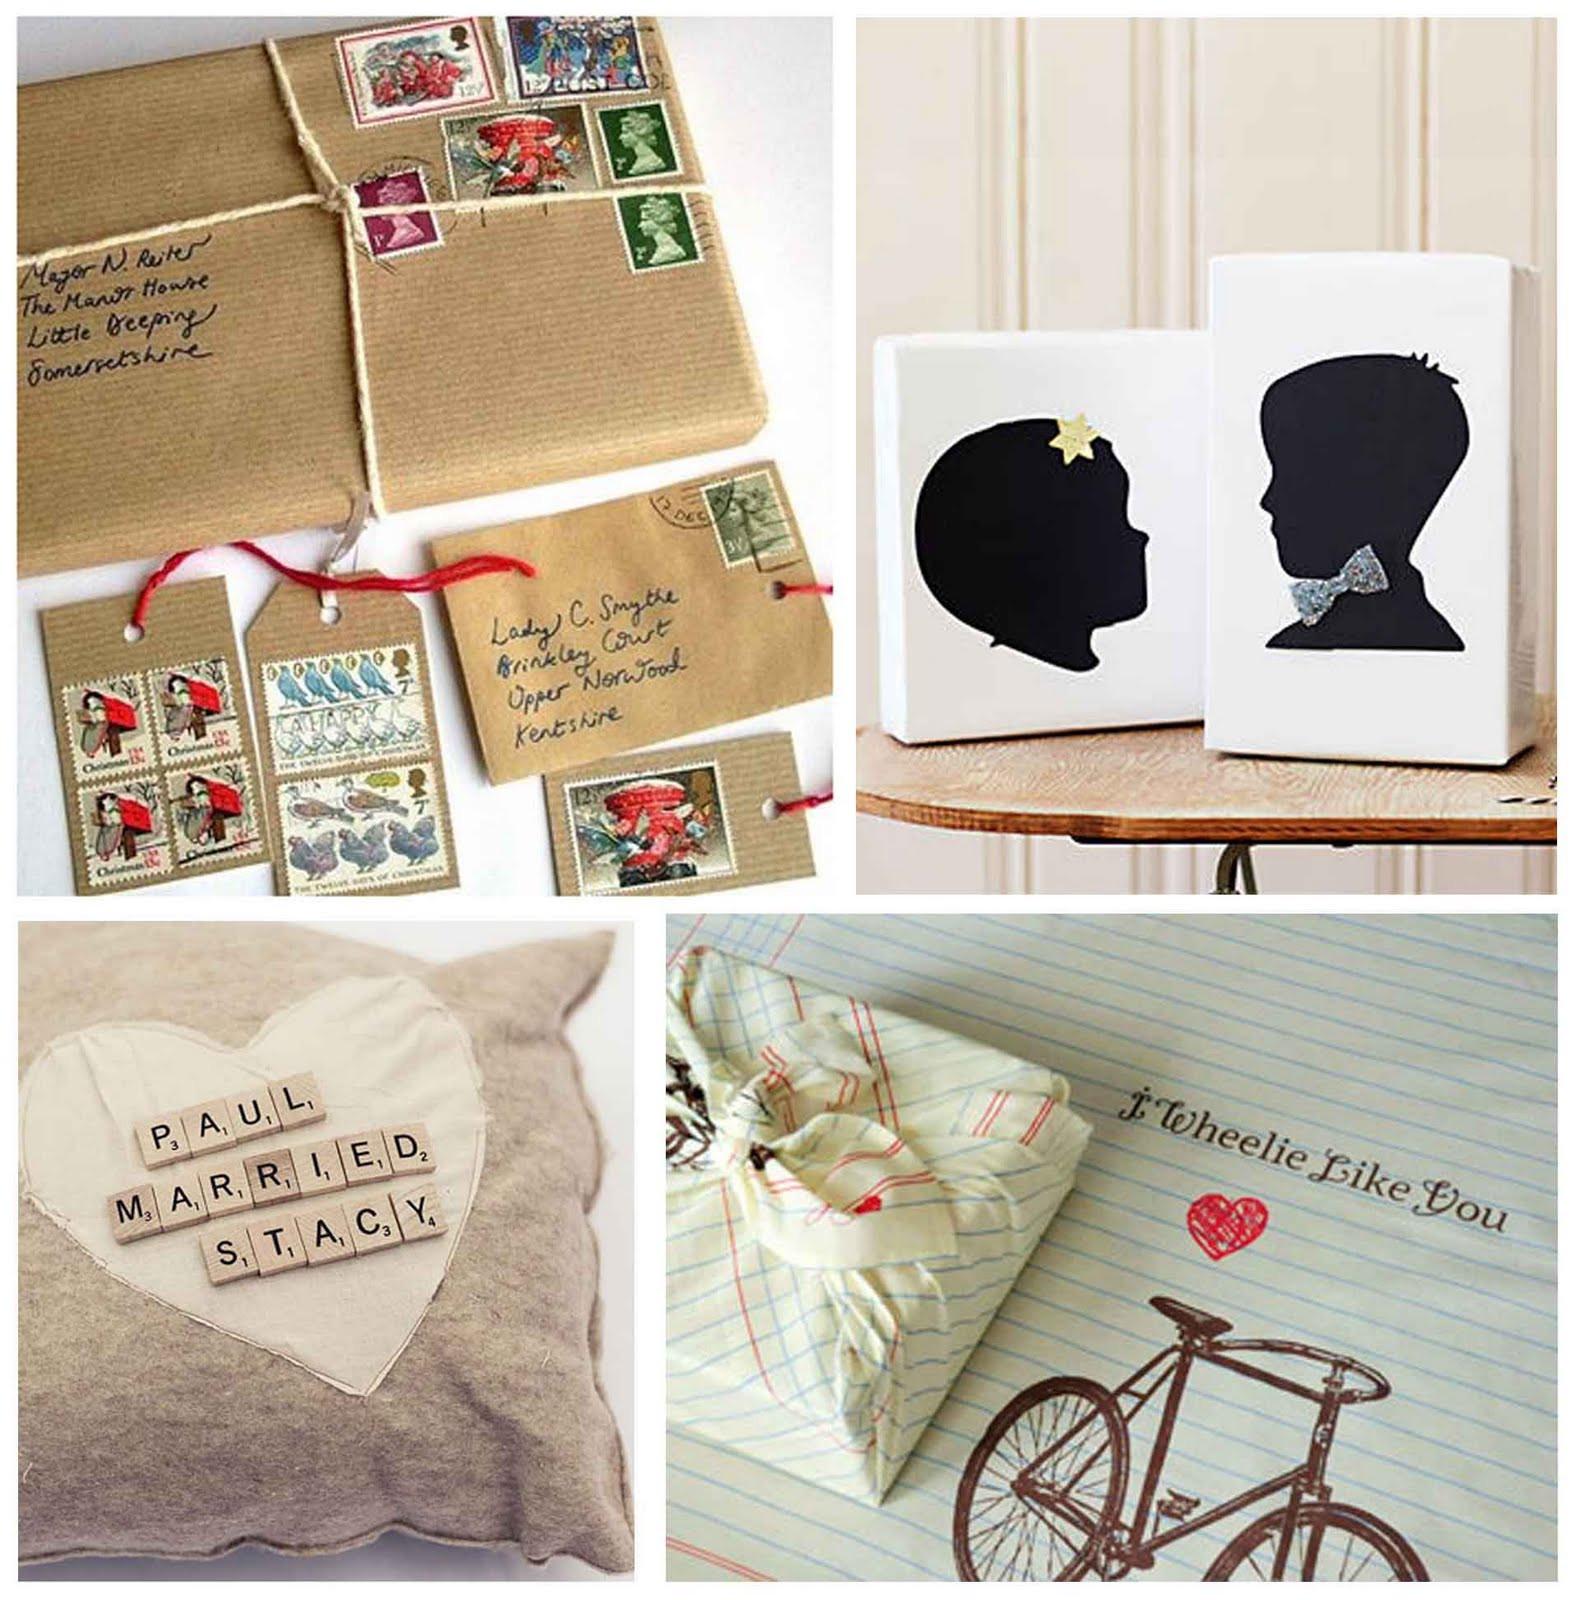 Best ideas about Fun Wedding Gift Ideas . Save or Pin Simply Fun Stuff Creative Wedding Gift Wrap Ideas Now.